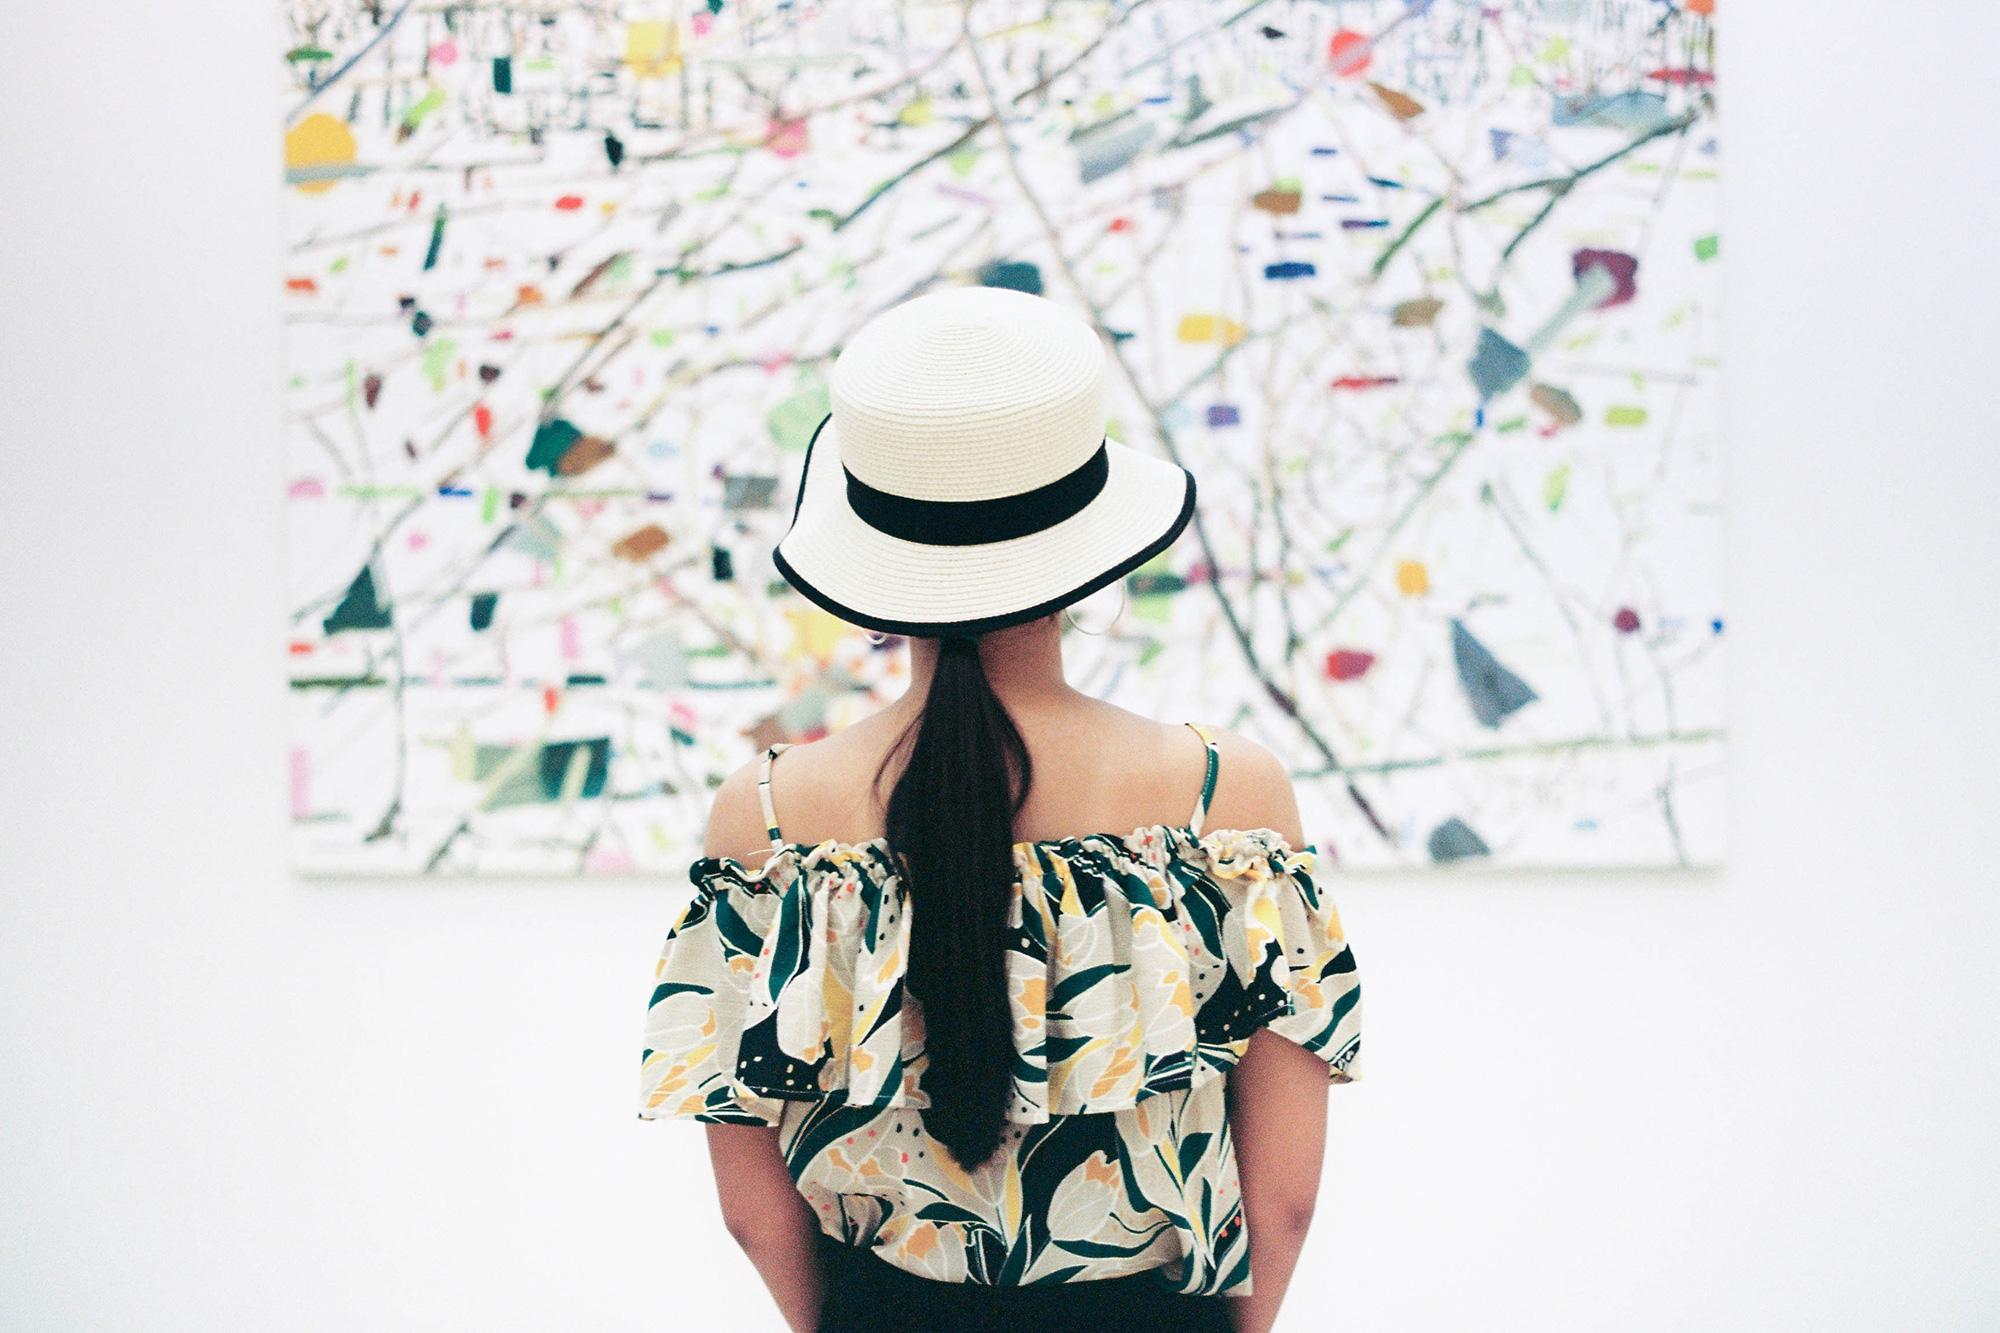 art-and-mindfulness.jpg